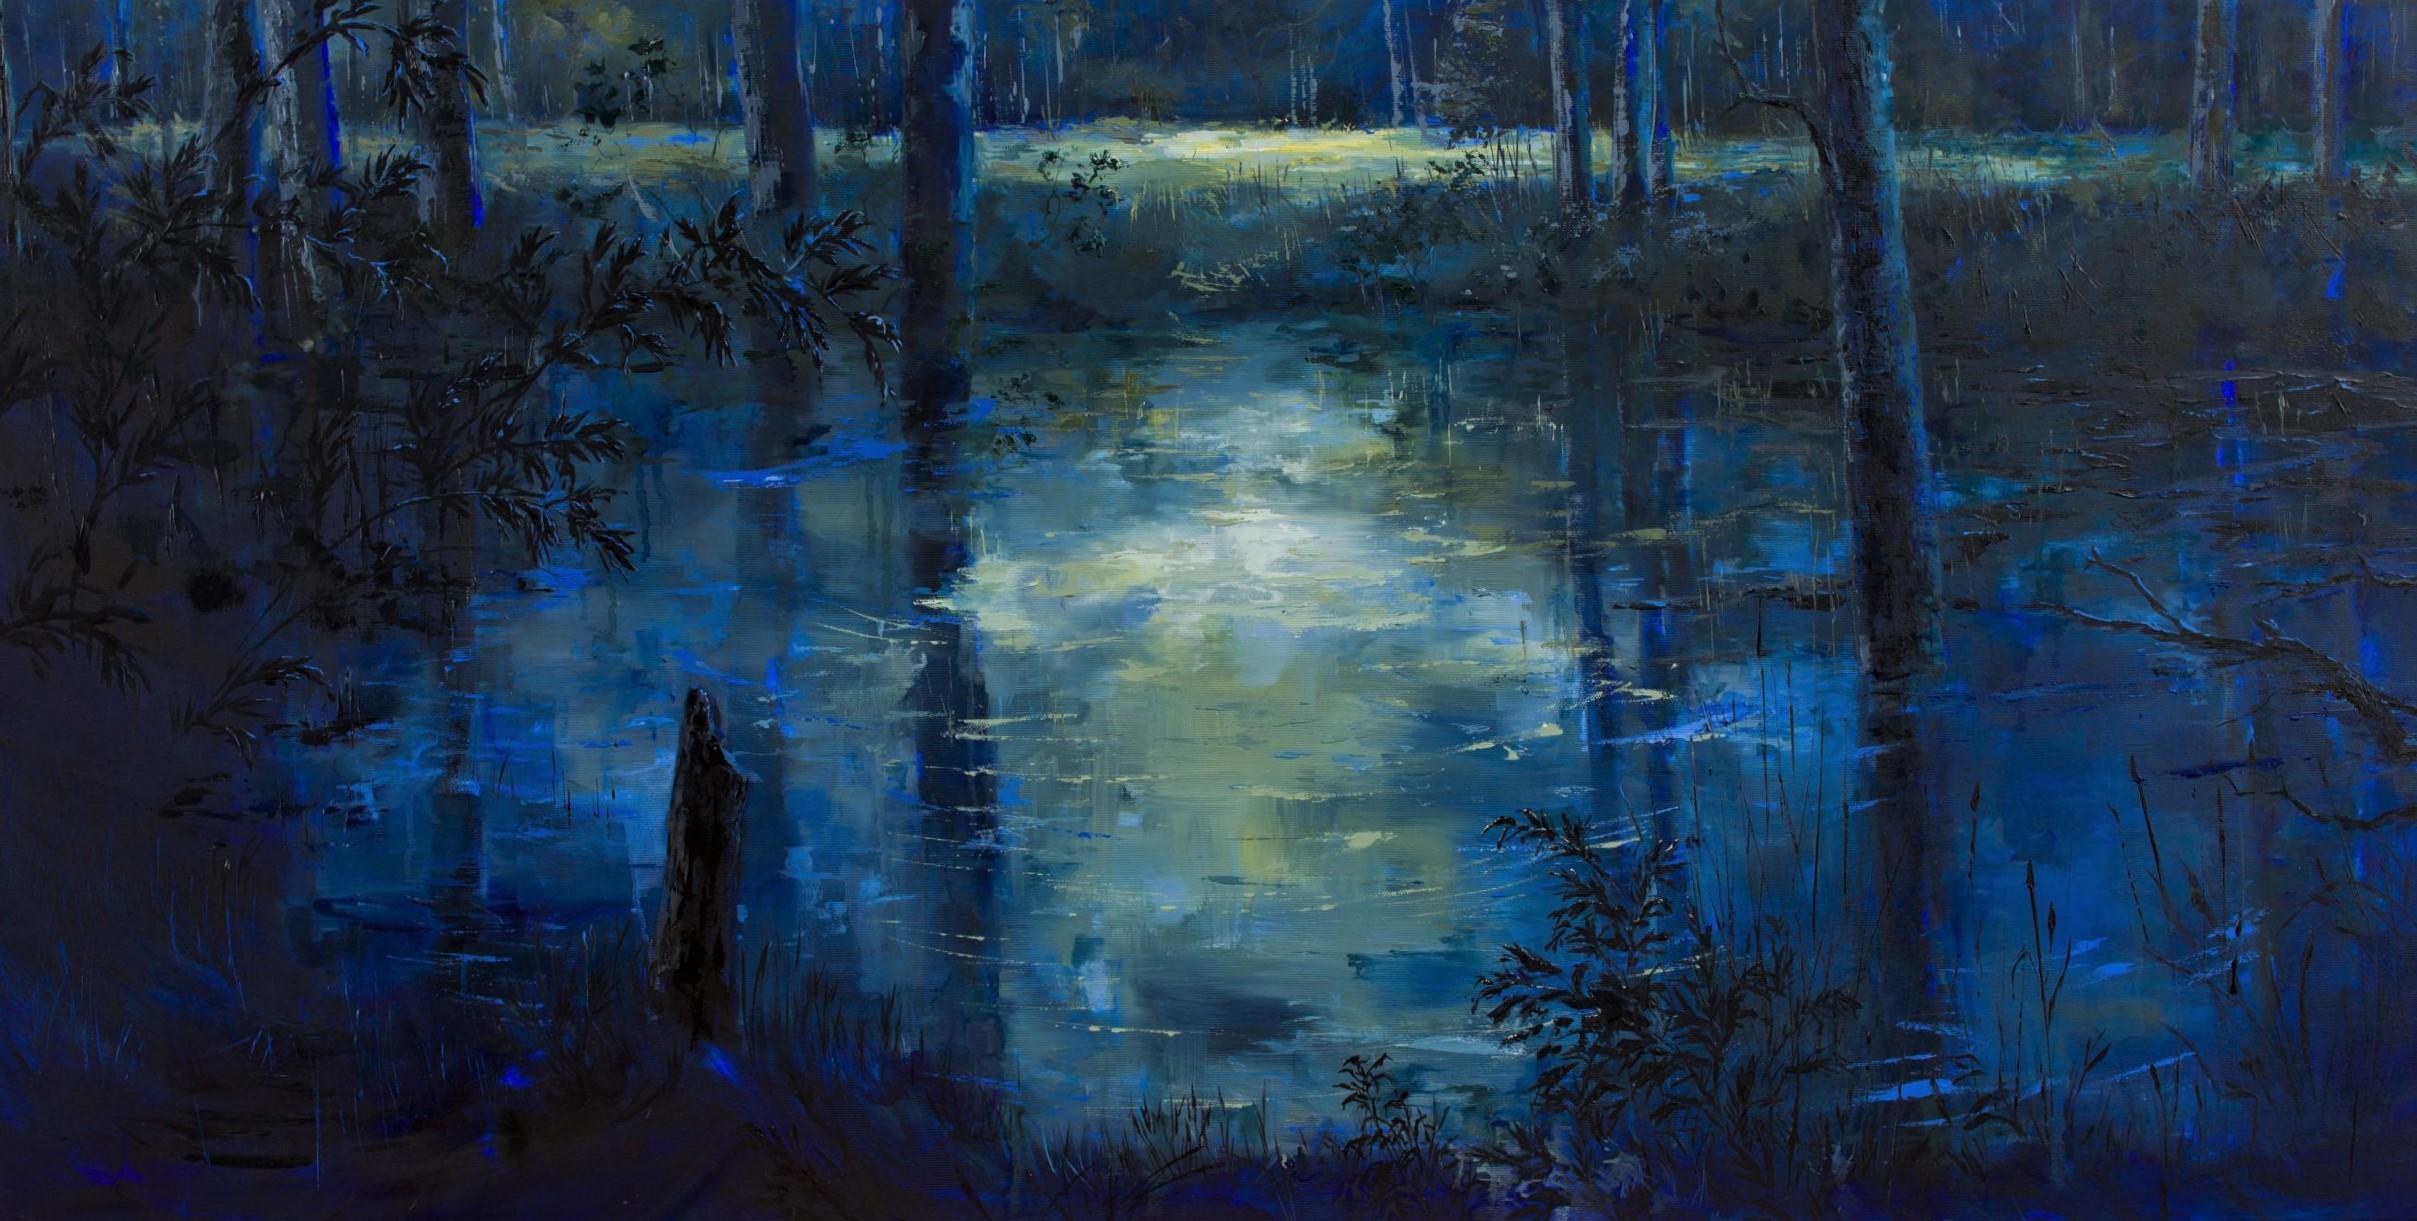 licht in het bos marein konijn 70 x 140 k